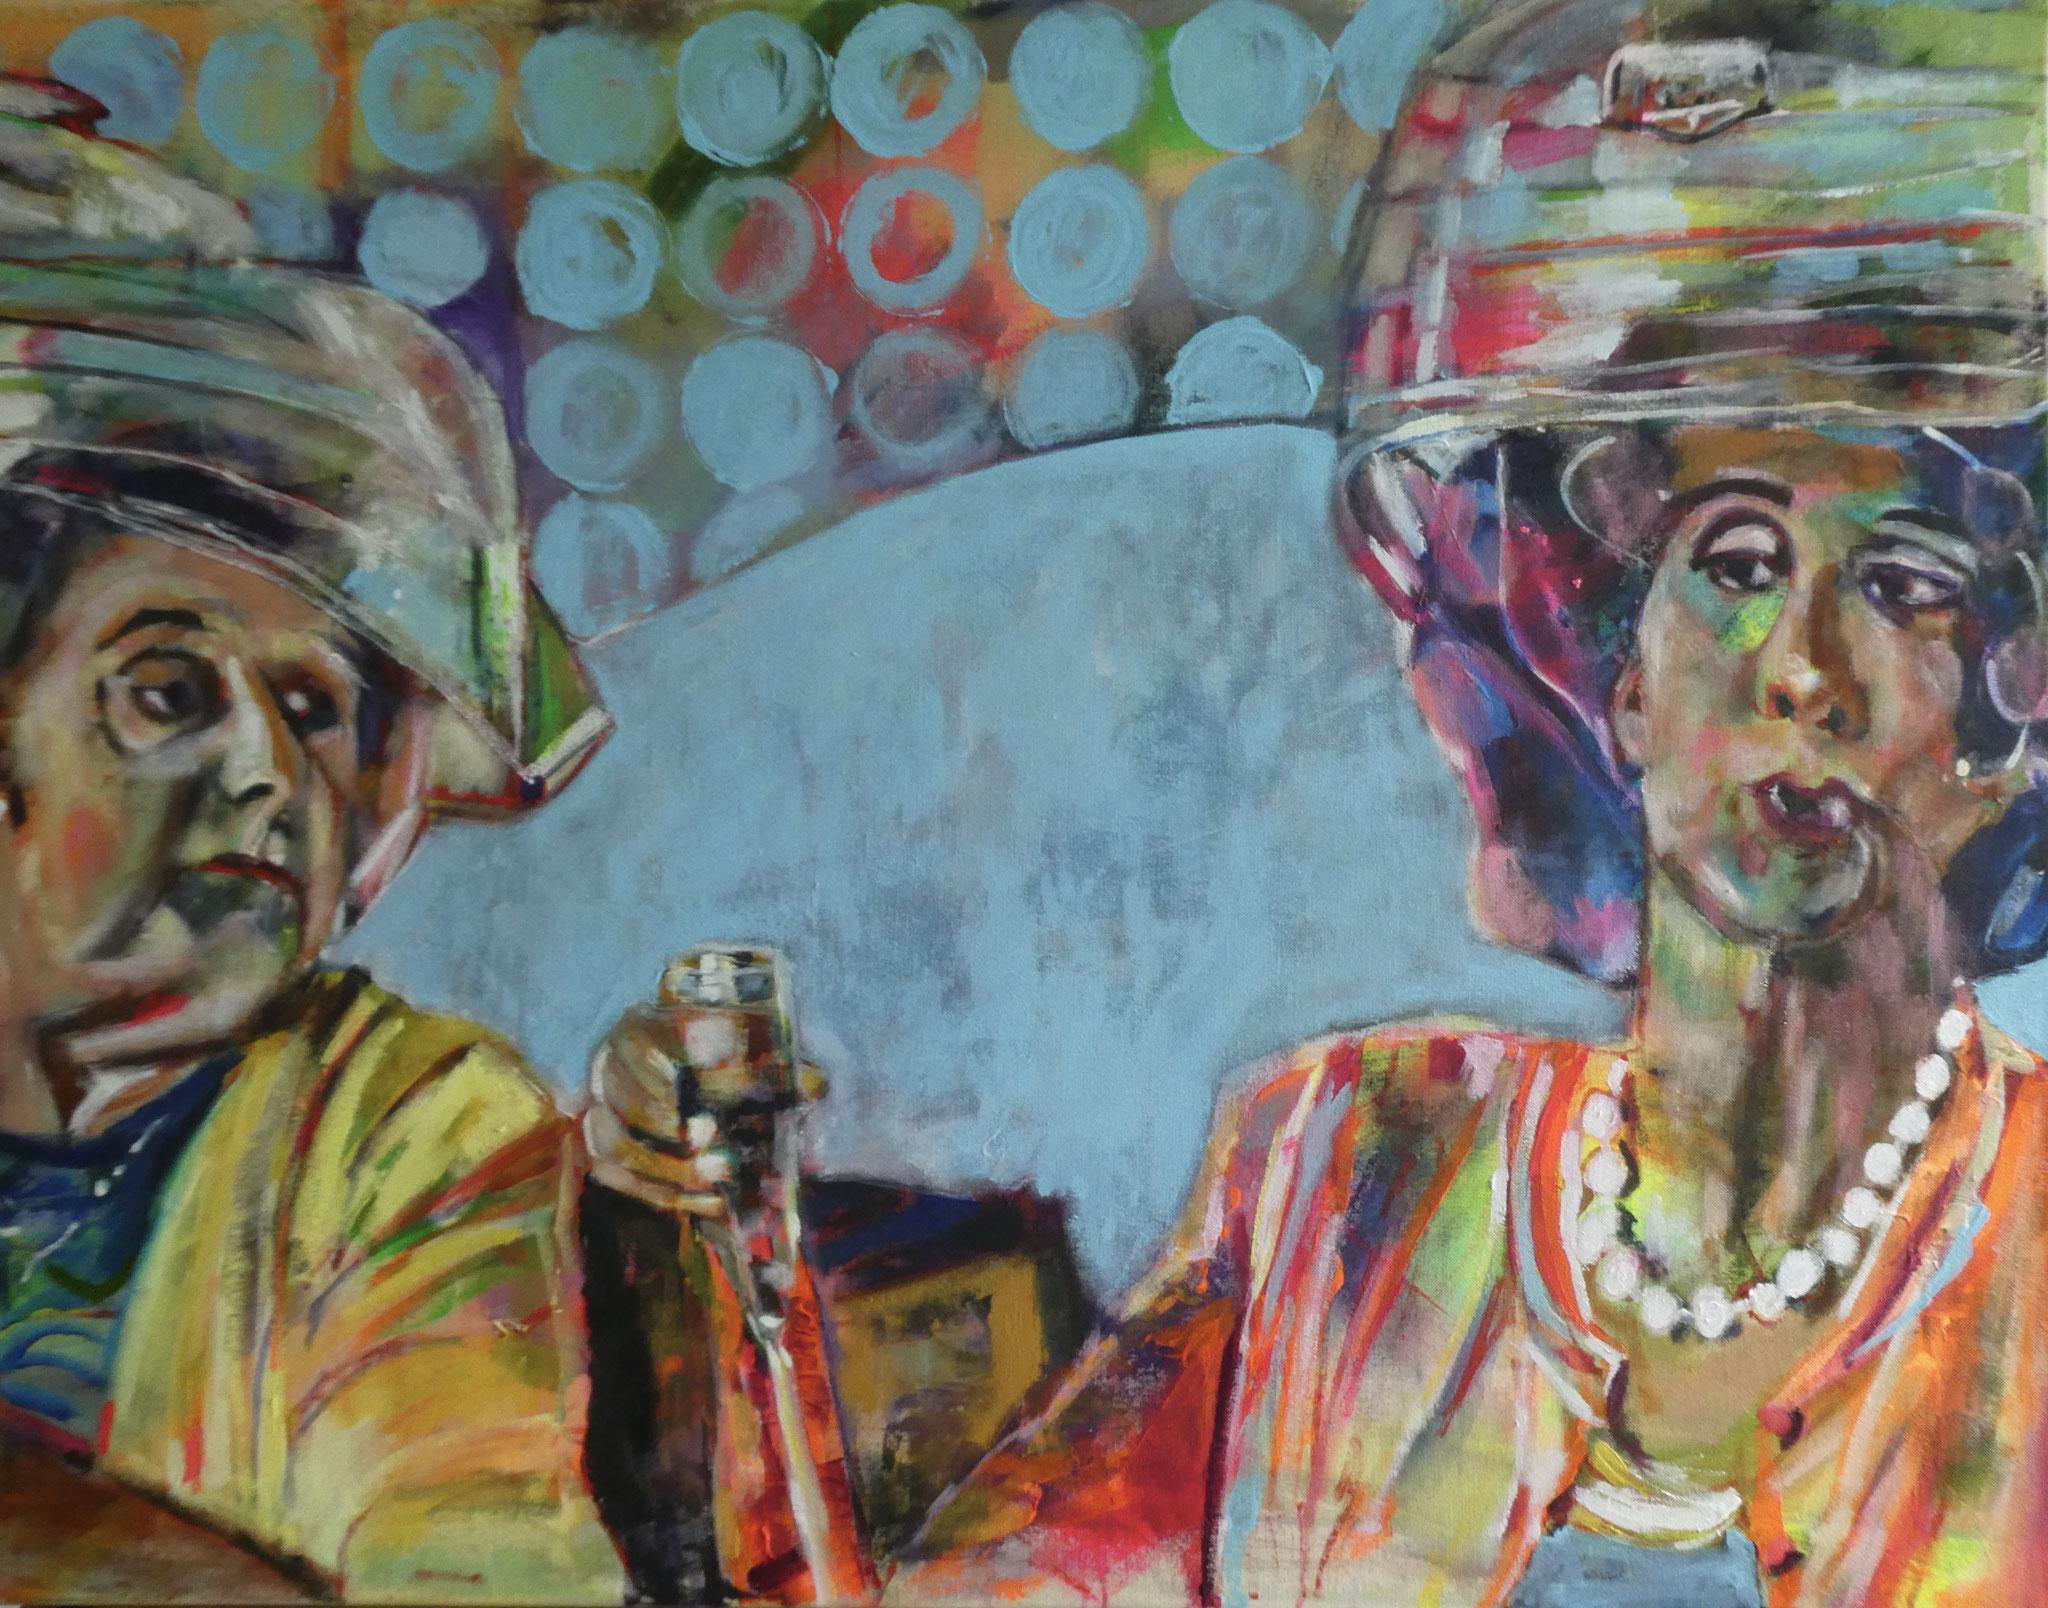 Auge in Auge: Paddington , 80x120, acrylic on canvas